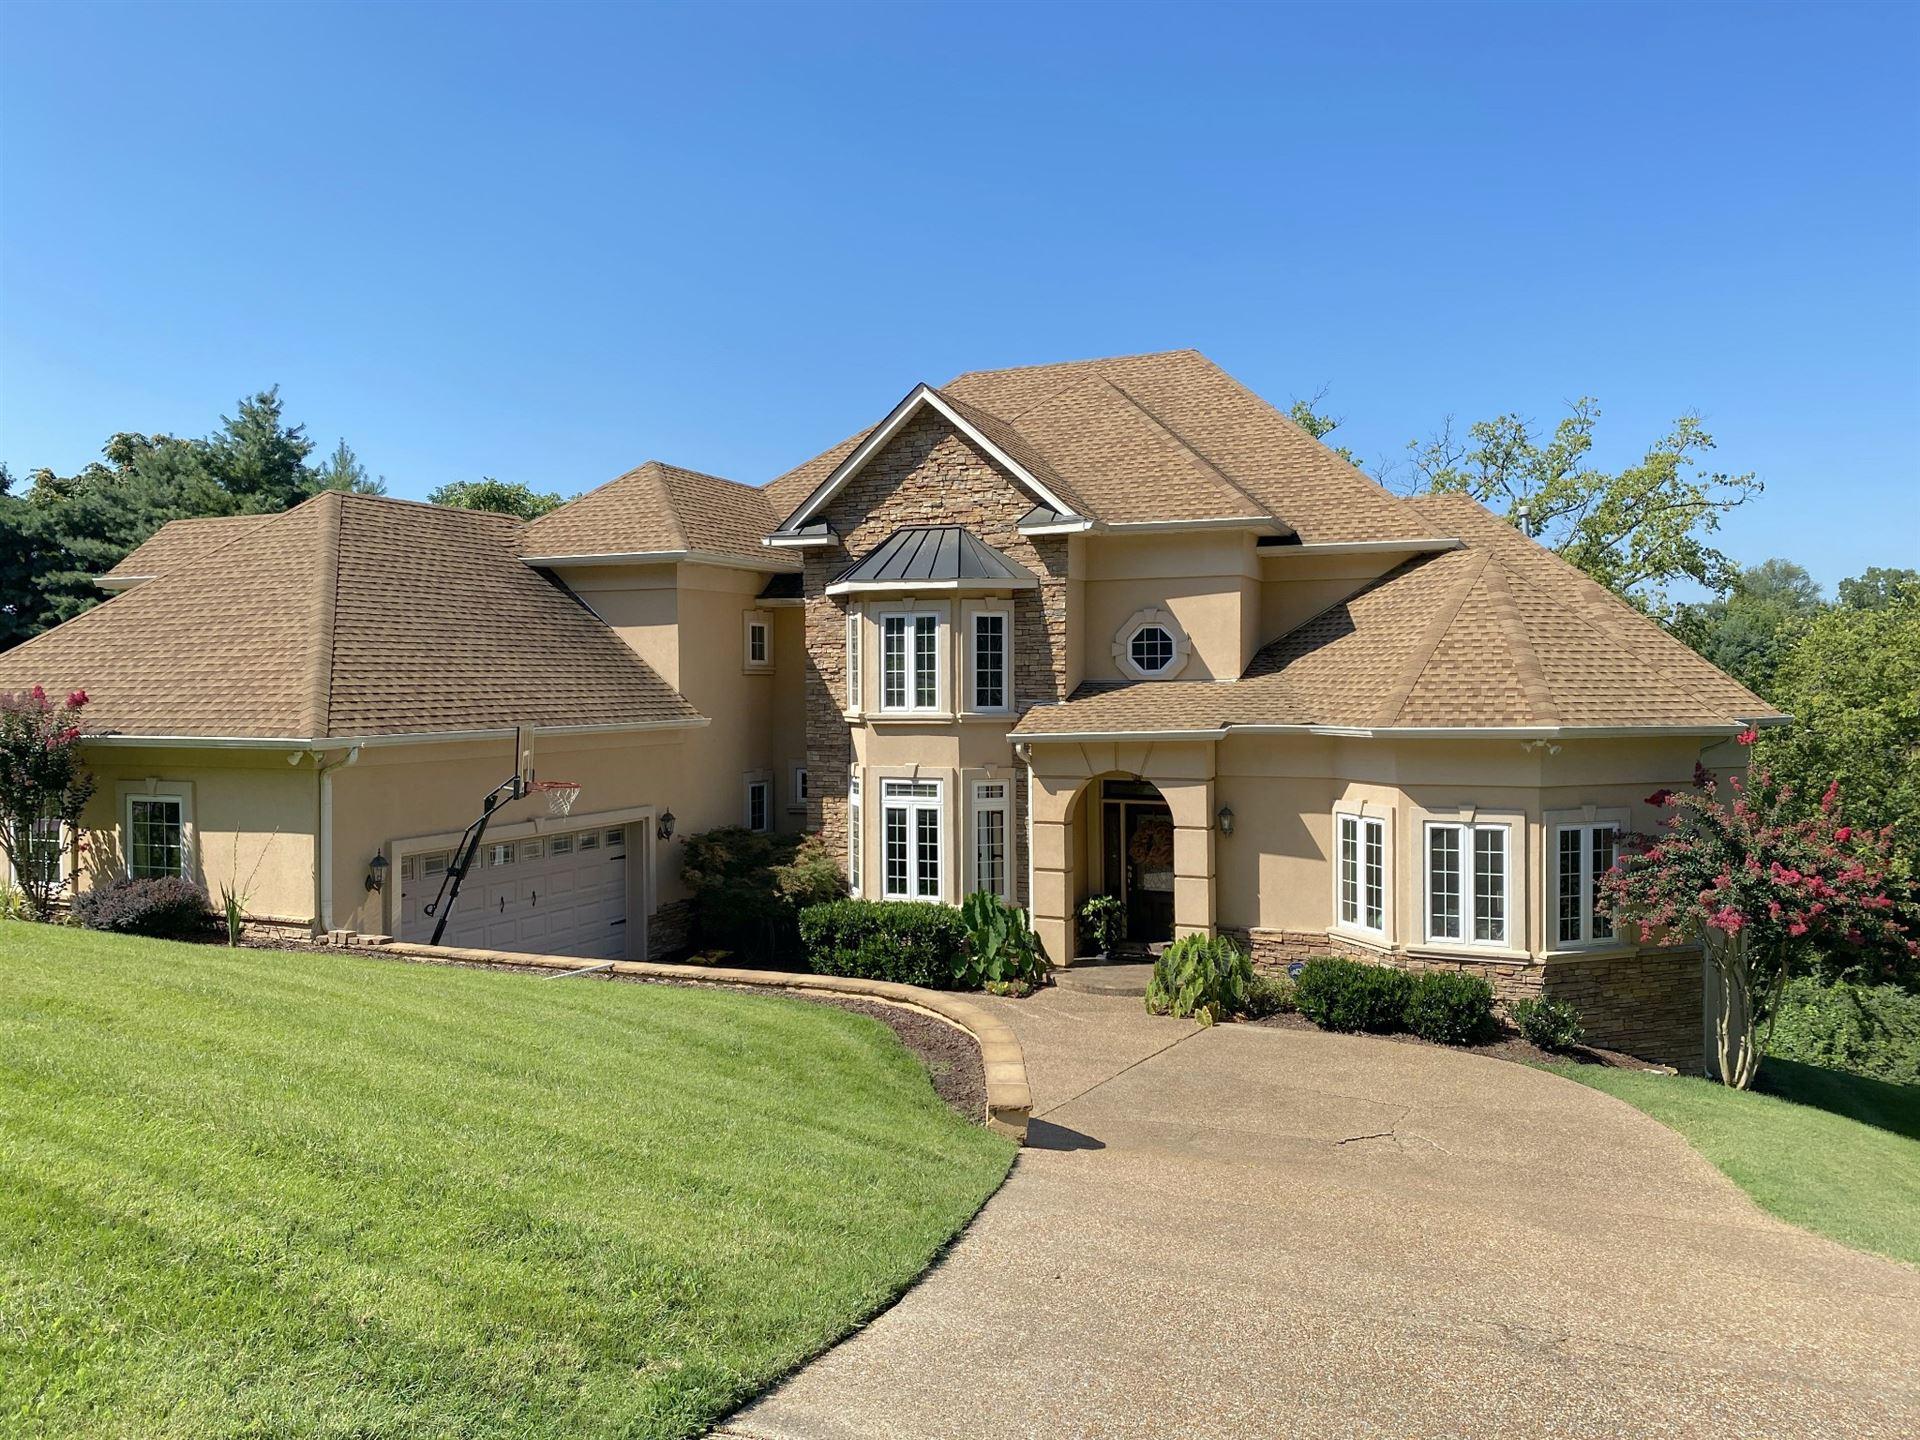 6036 Woodland Hills Dr, Nashville, TN 37211 - MLS#: 2265430